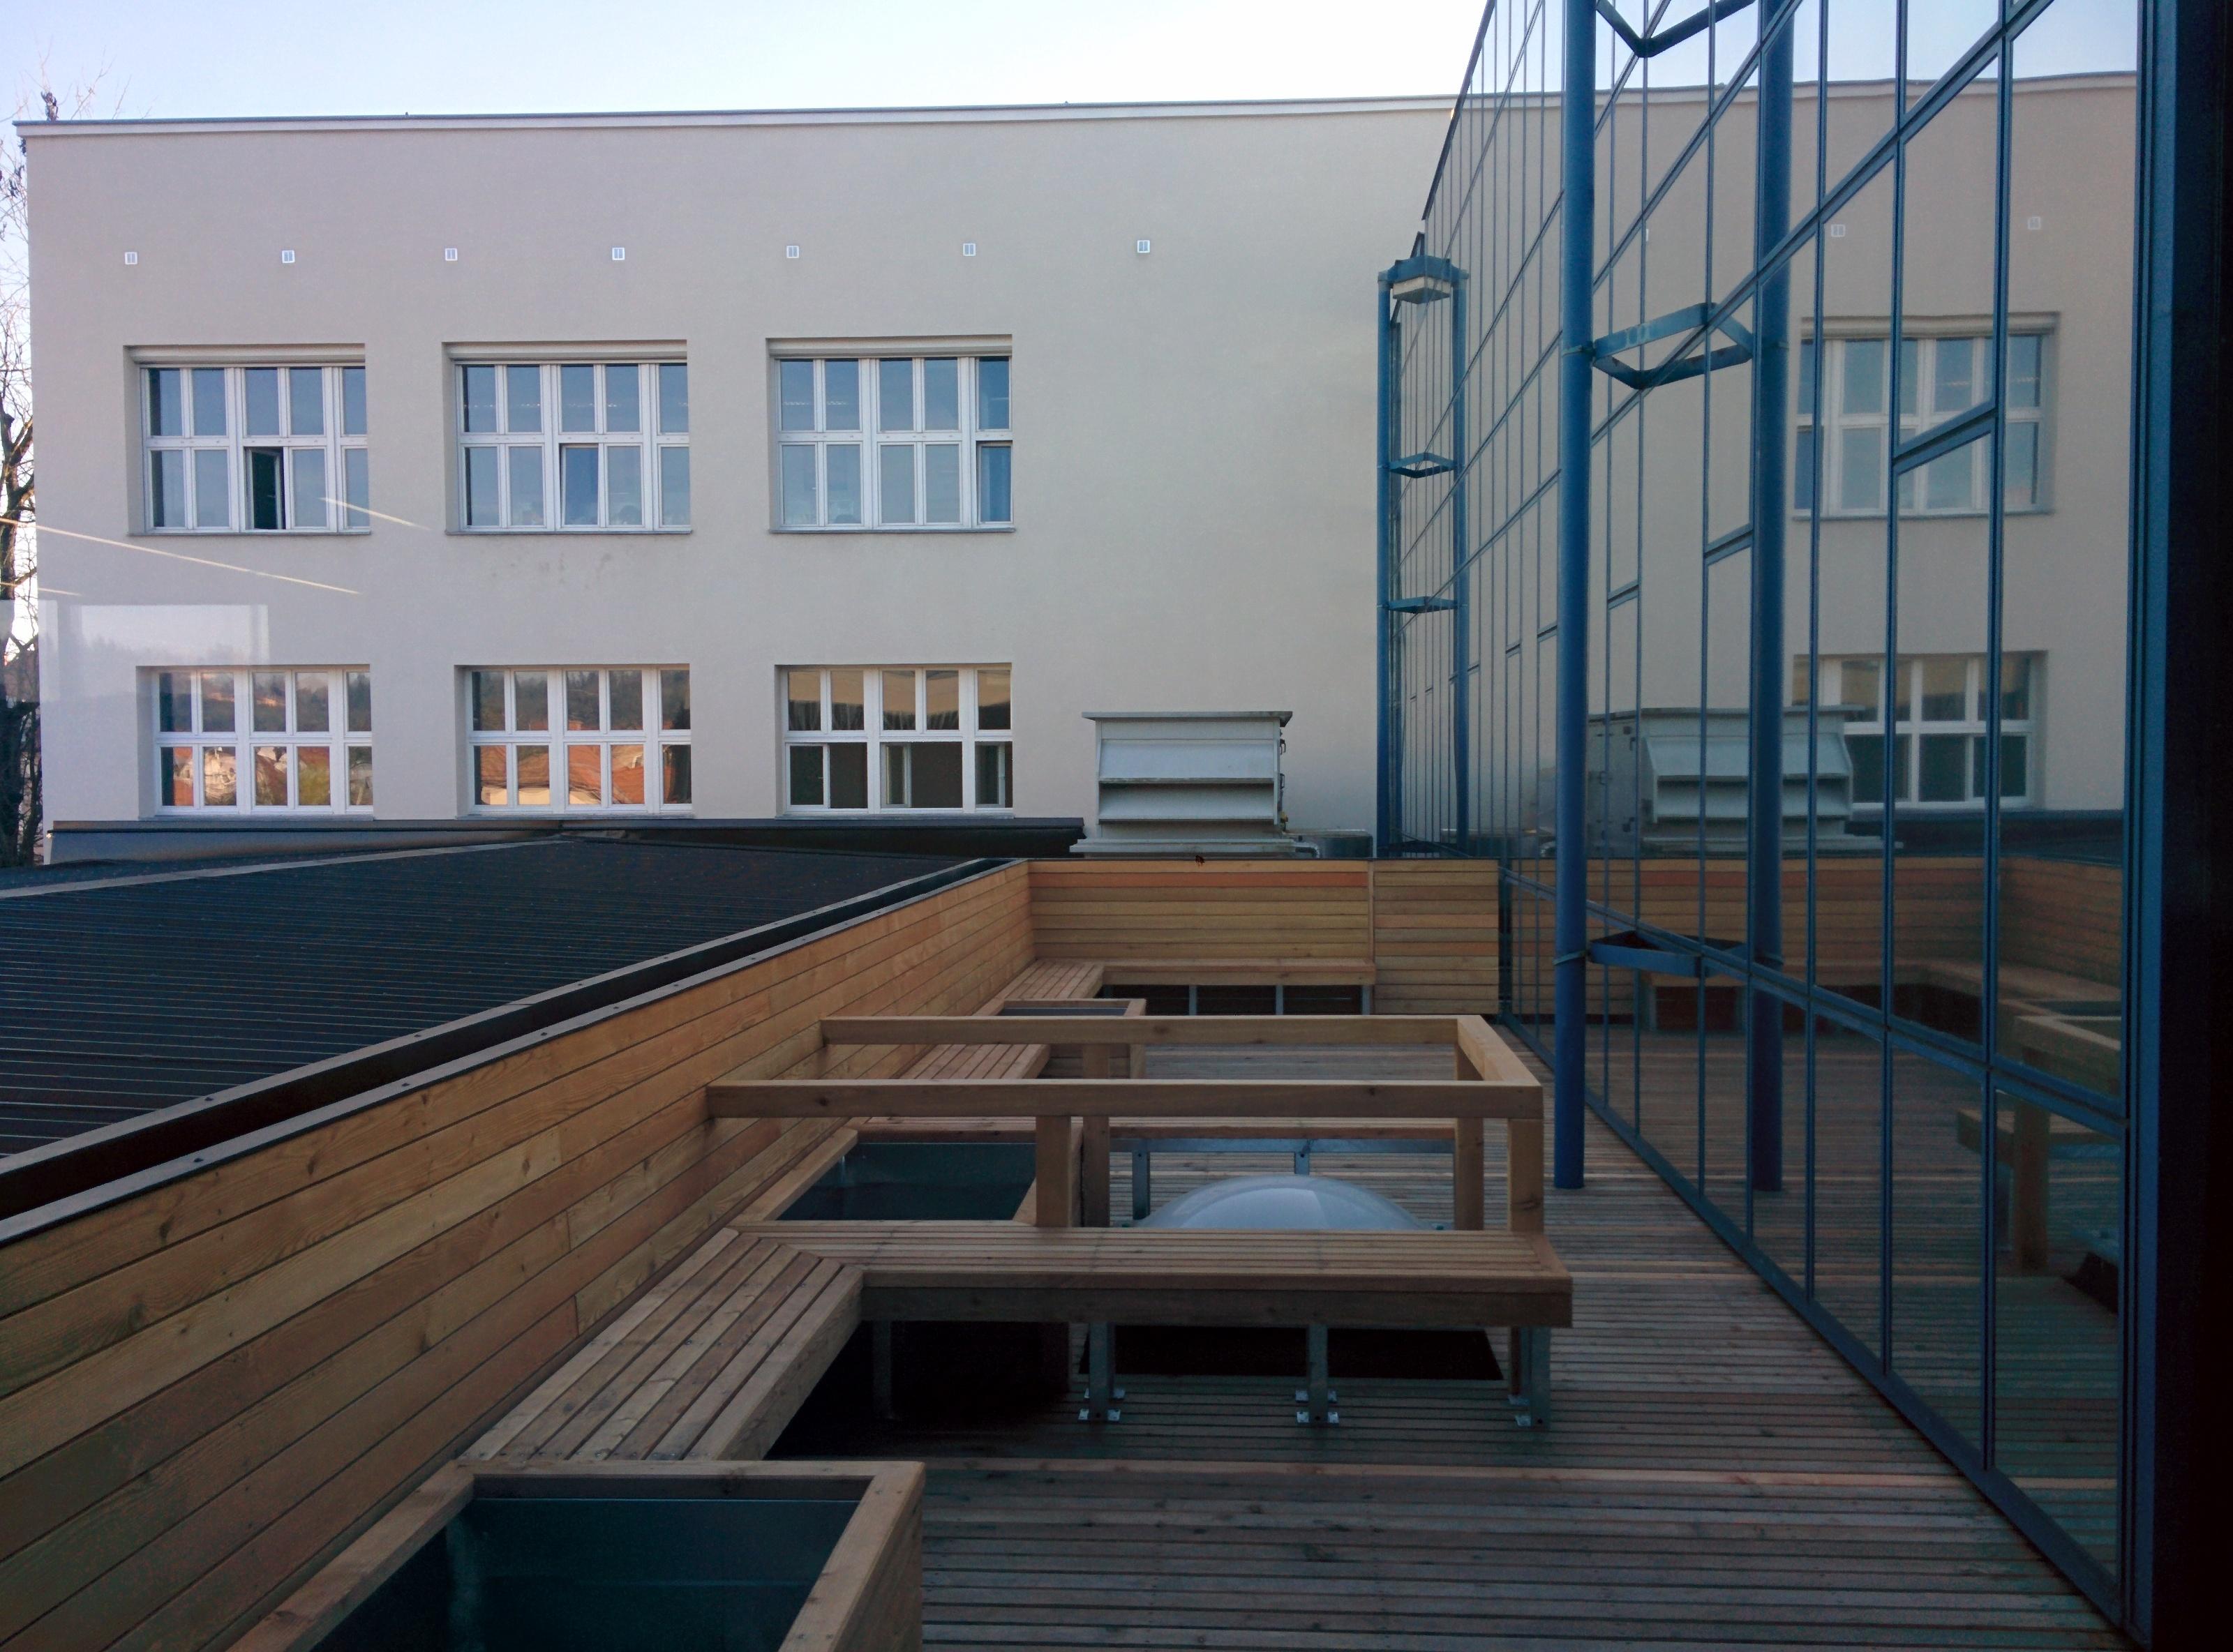 Terrace on high school vic ljubljana archdesign for School terrace